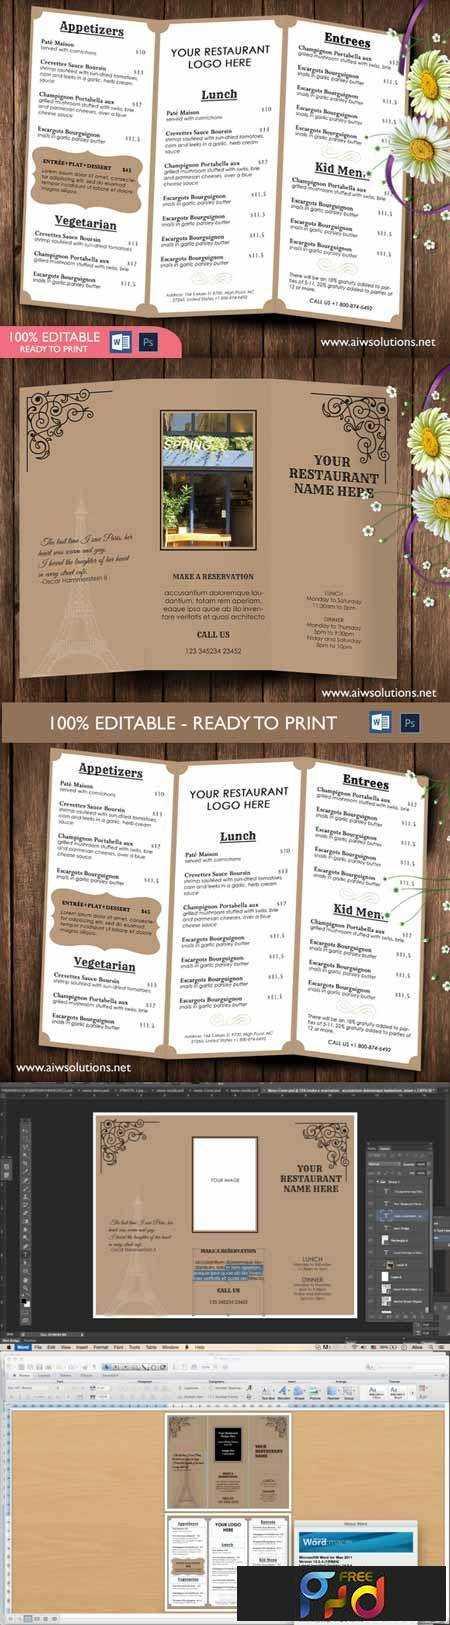 freepsdvn-com_1458862284_food-menu-template-596645